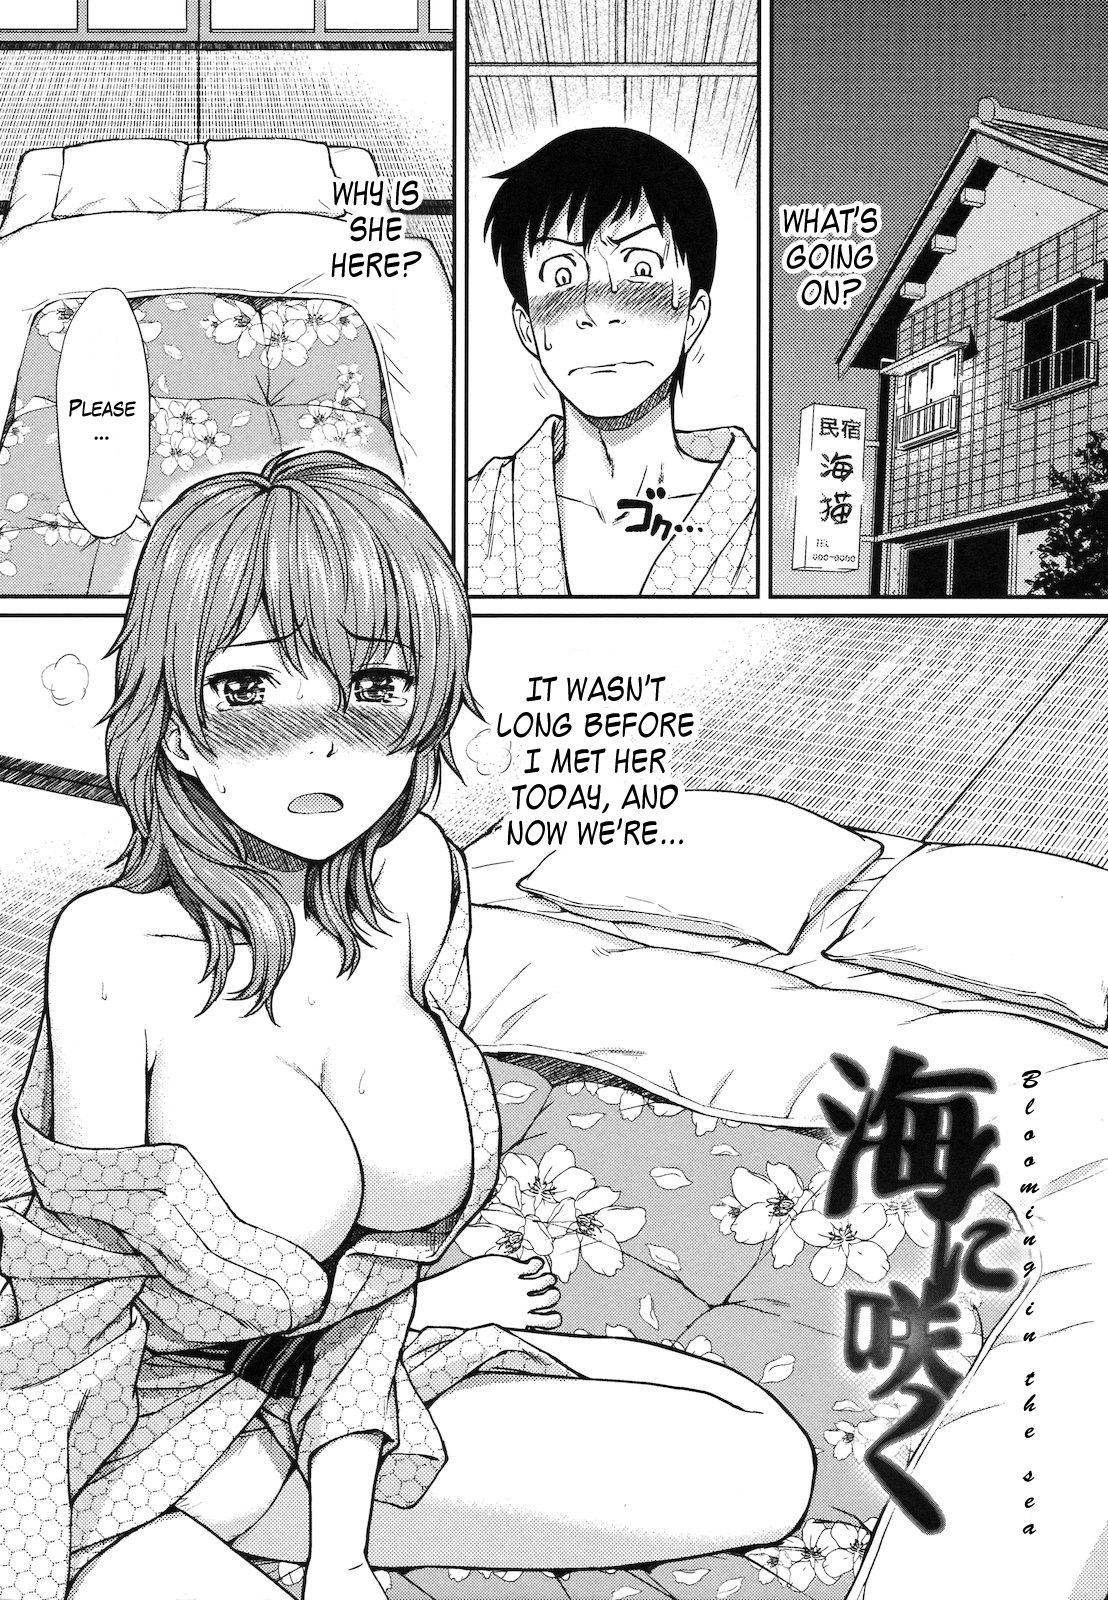 00 vanilla hentai FTW www hentairules net 01